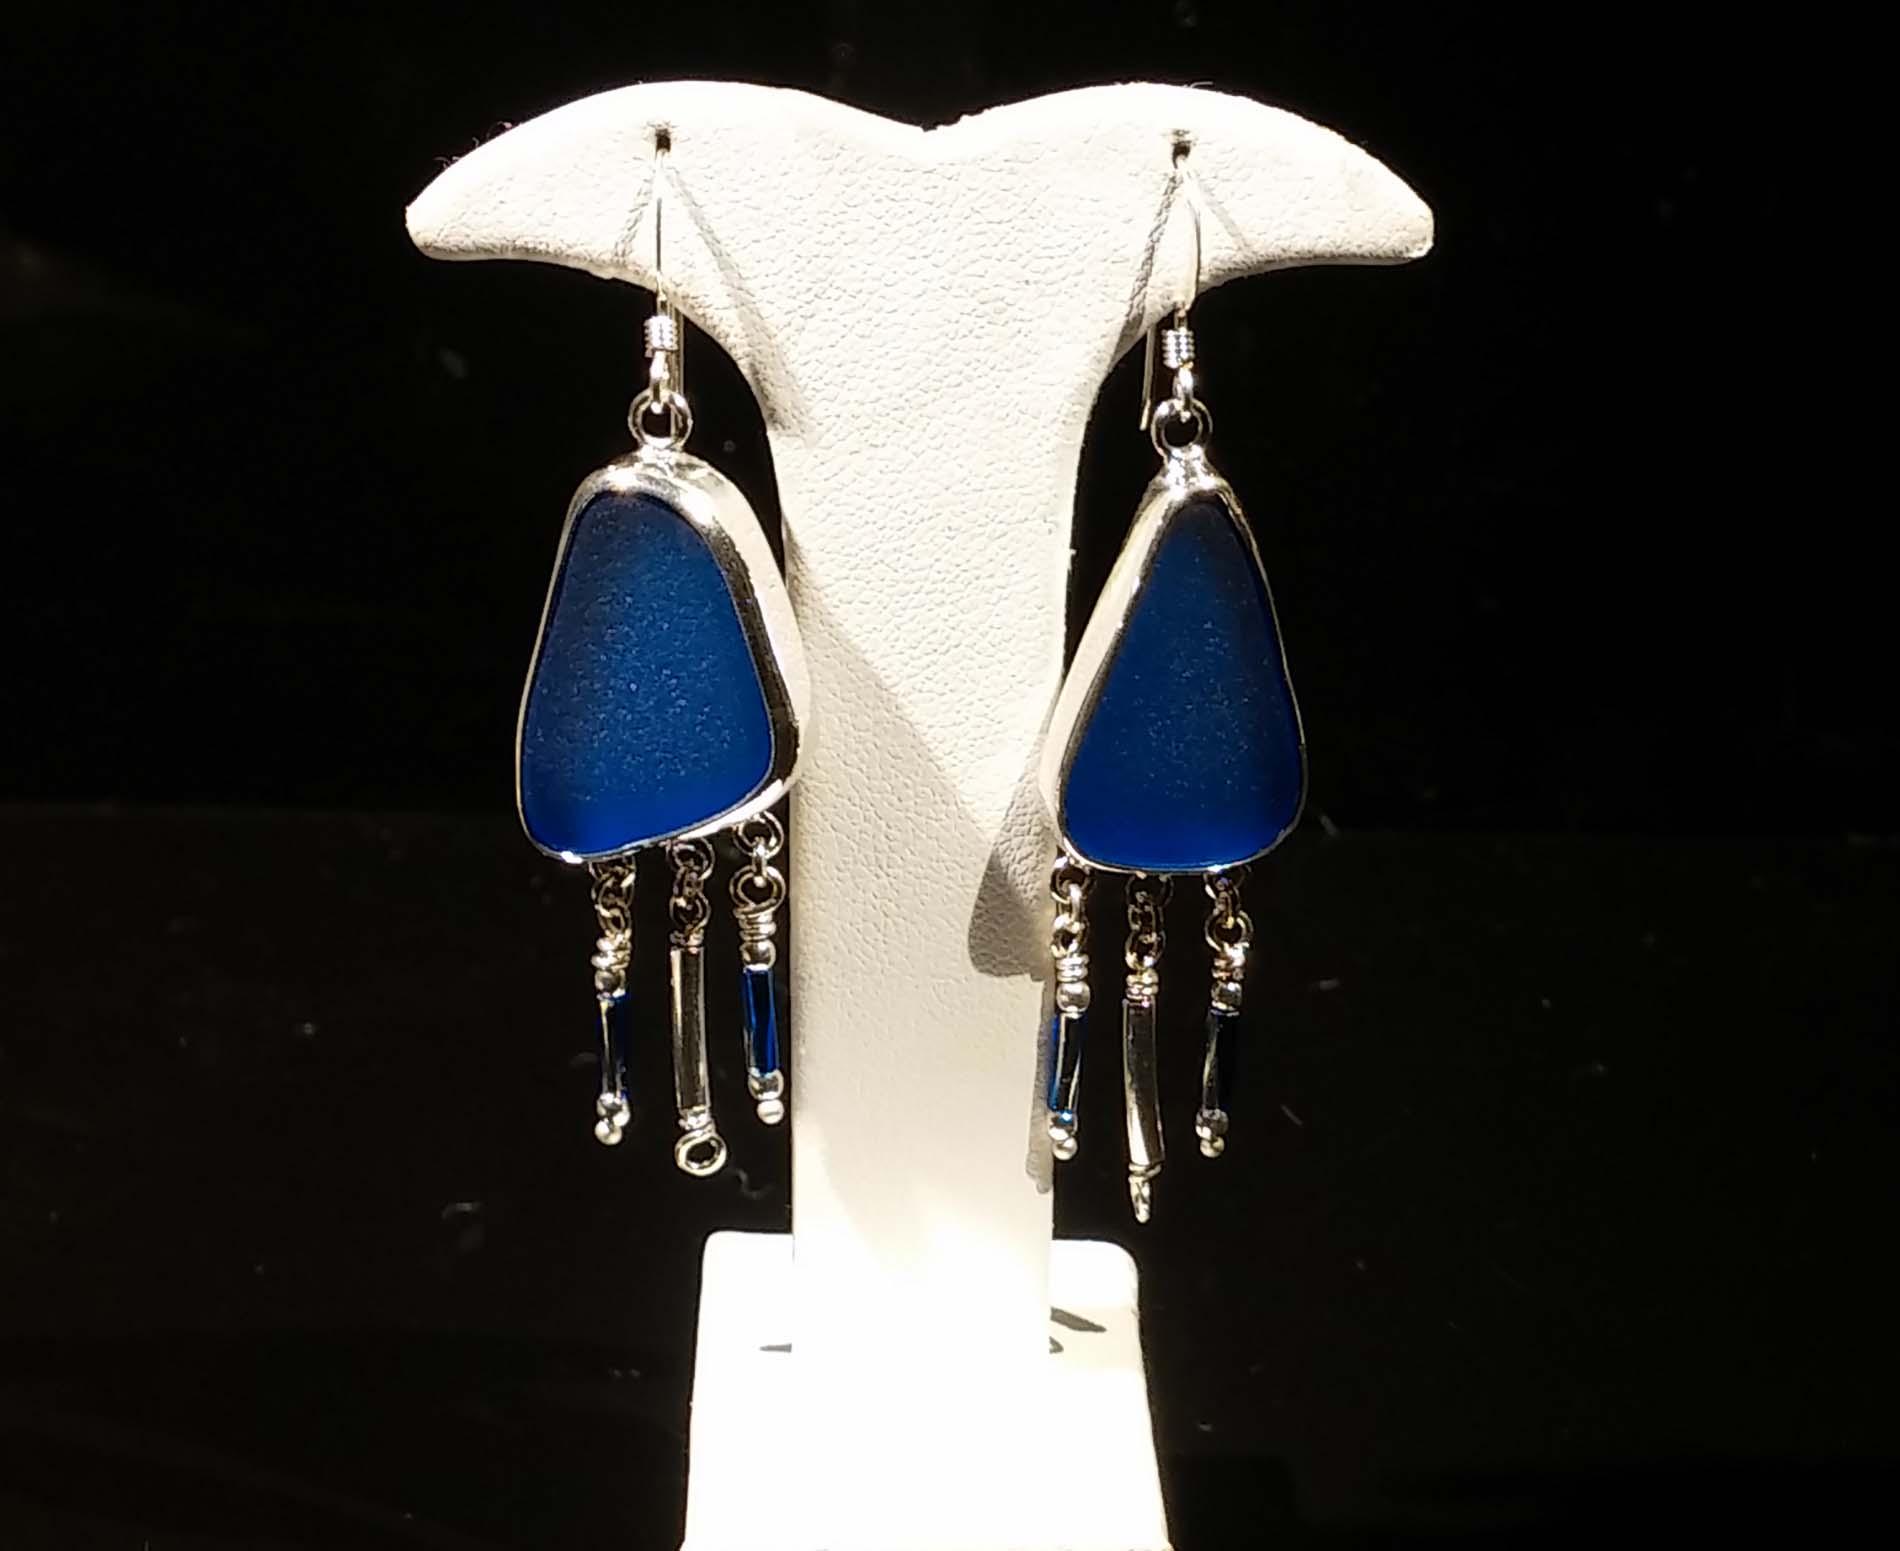 Seaglass Beads Earrings